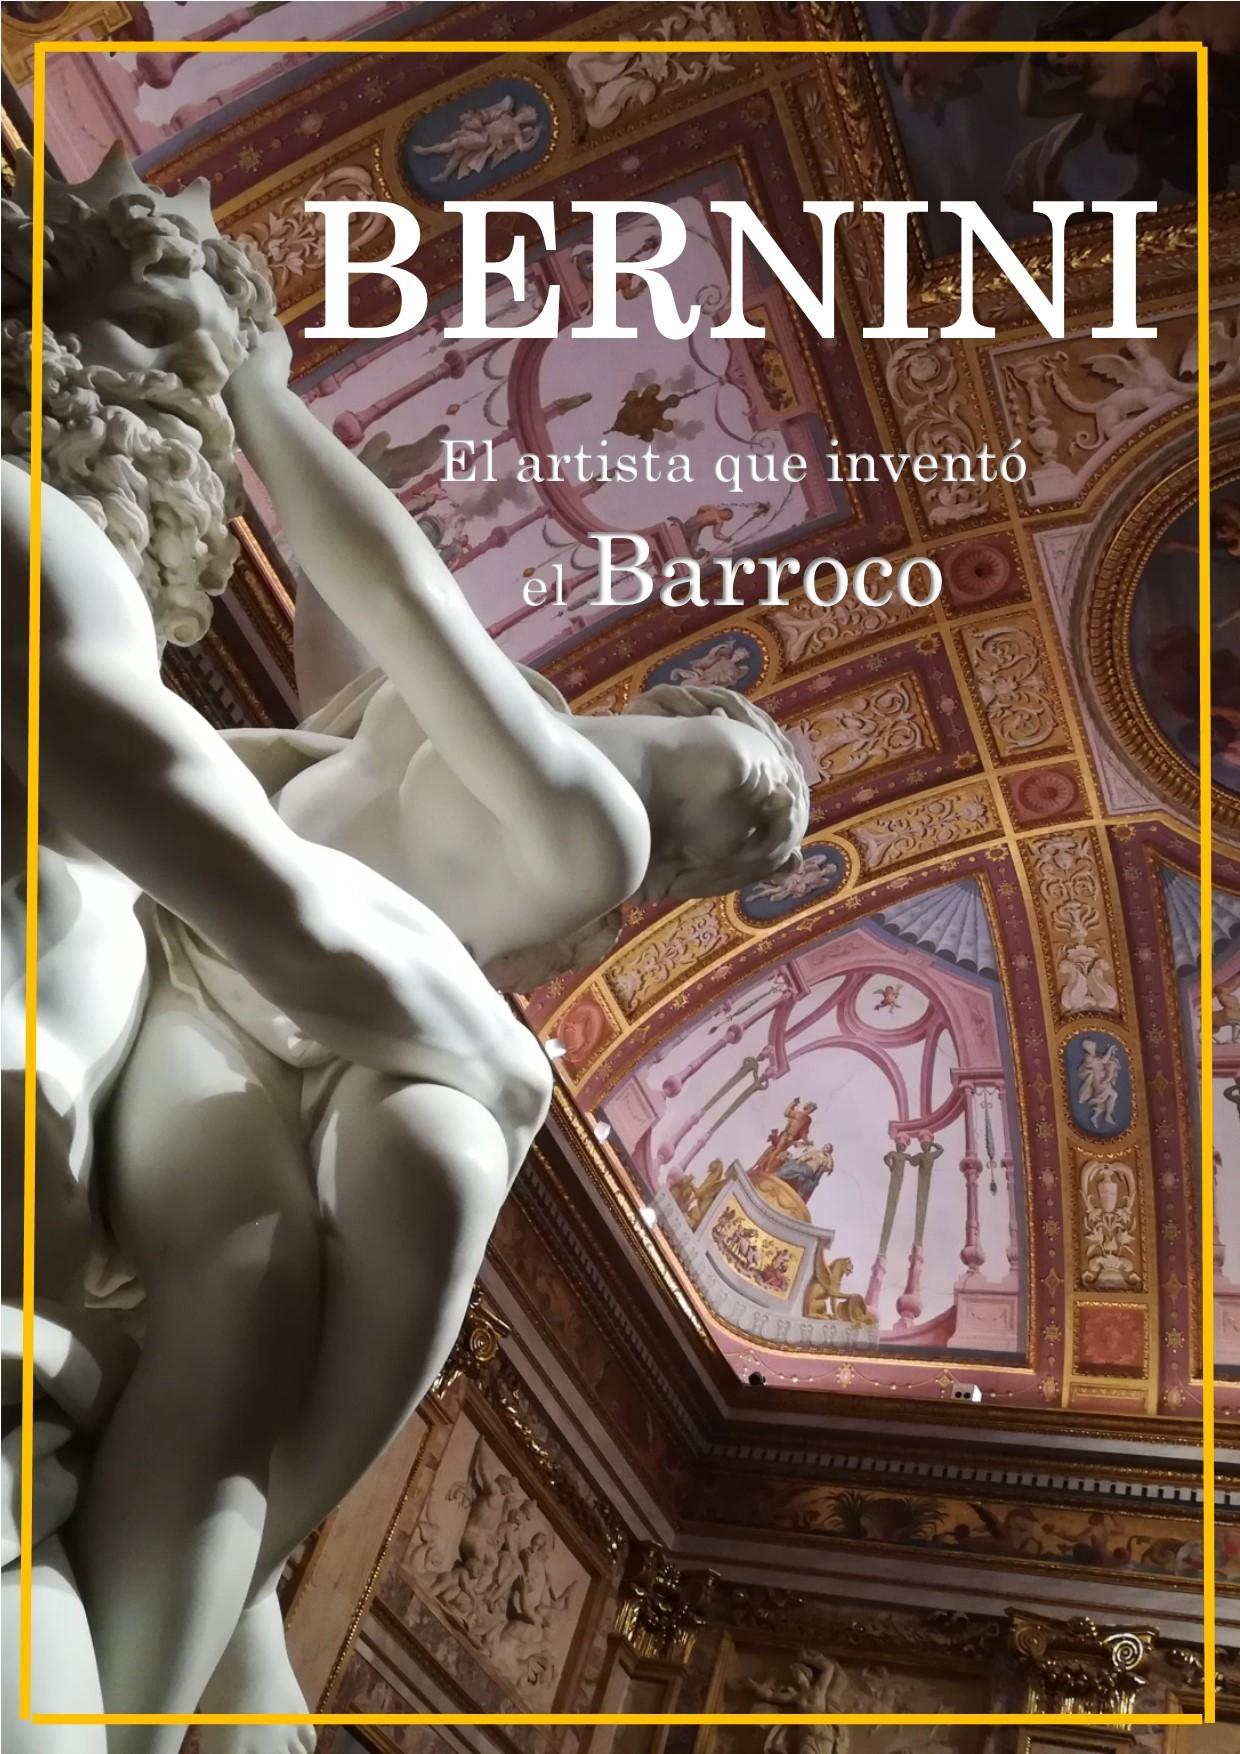 Cartel de Bernini, el artista que inventó el barroco